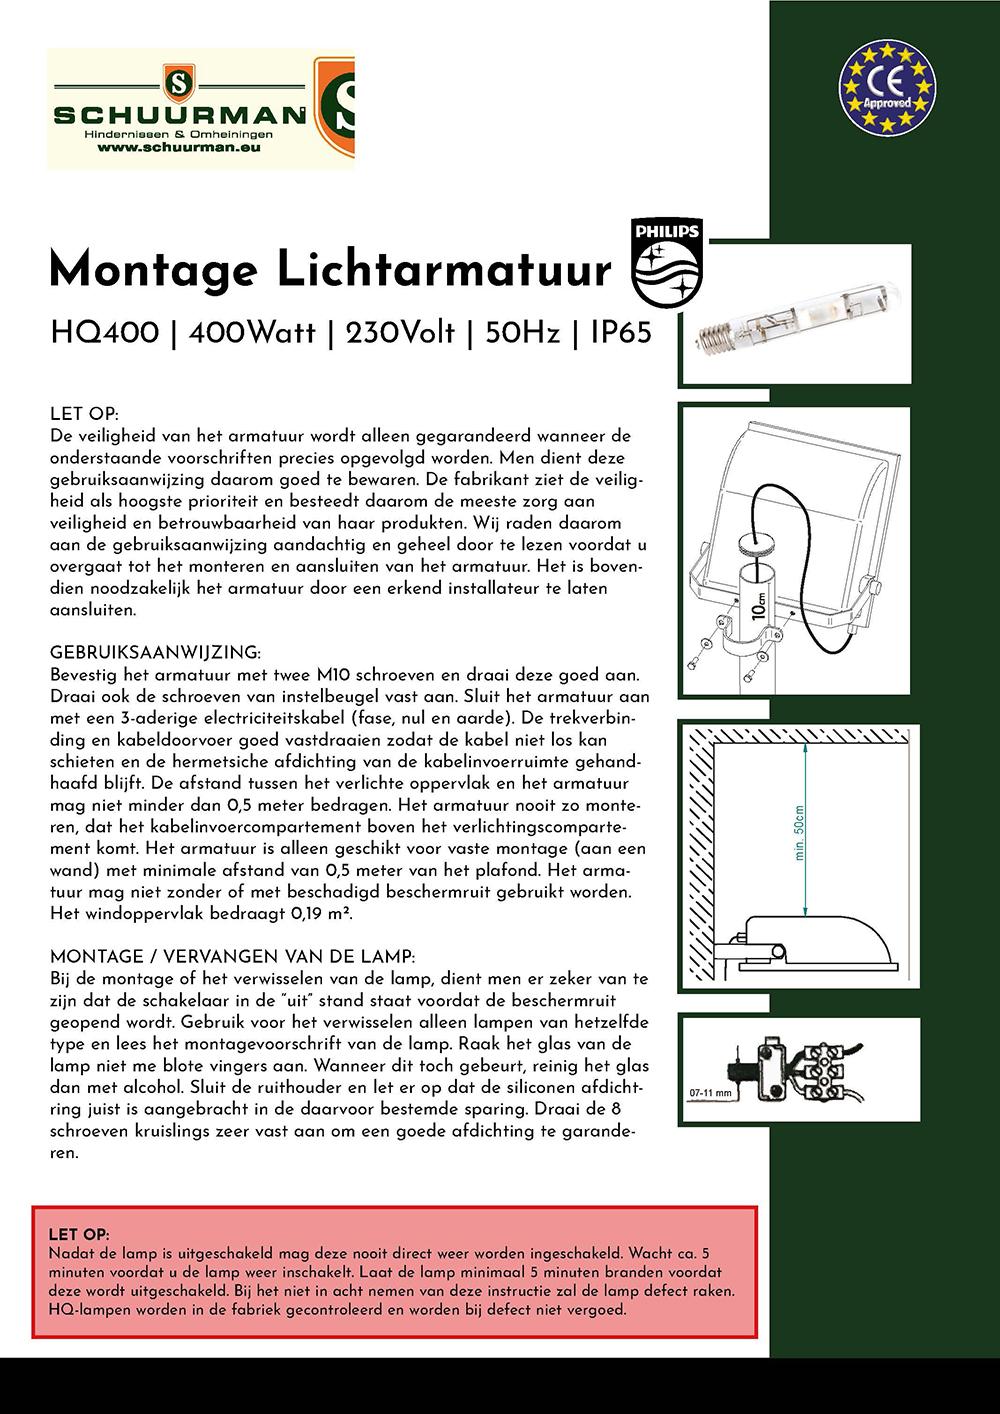 Brochure-montage-lichtarmatuur-hq400-400watt